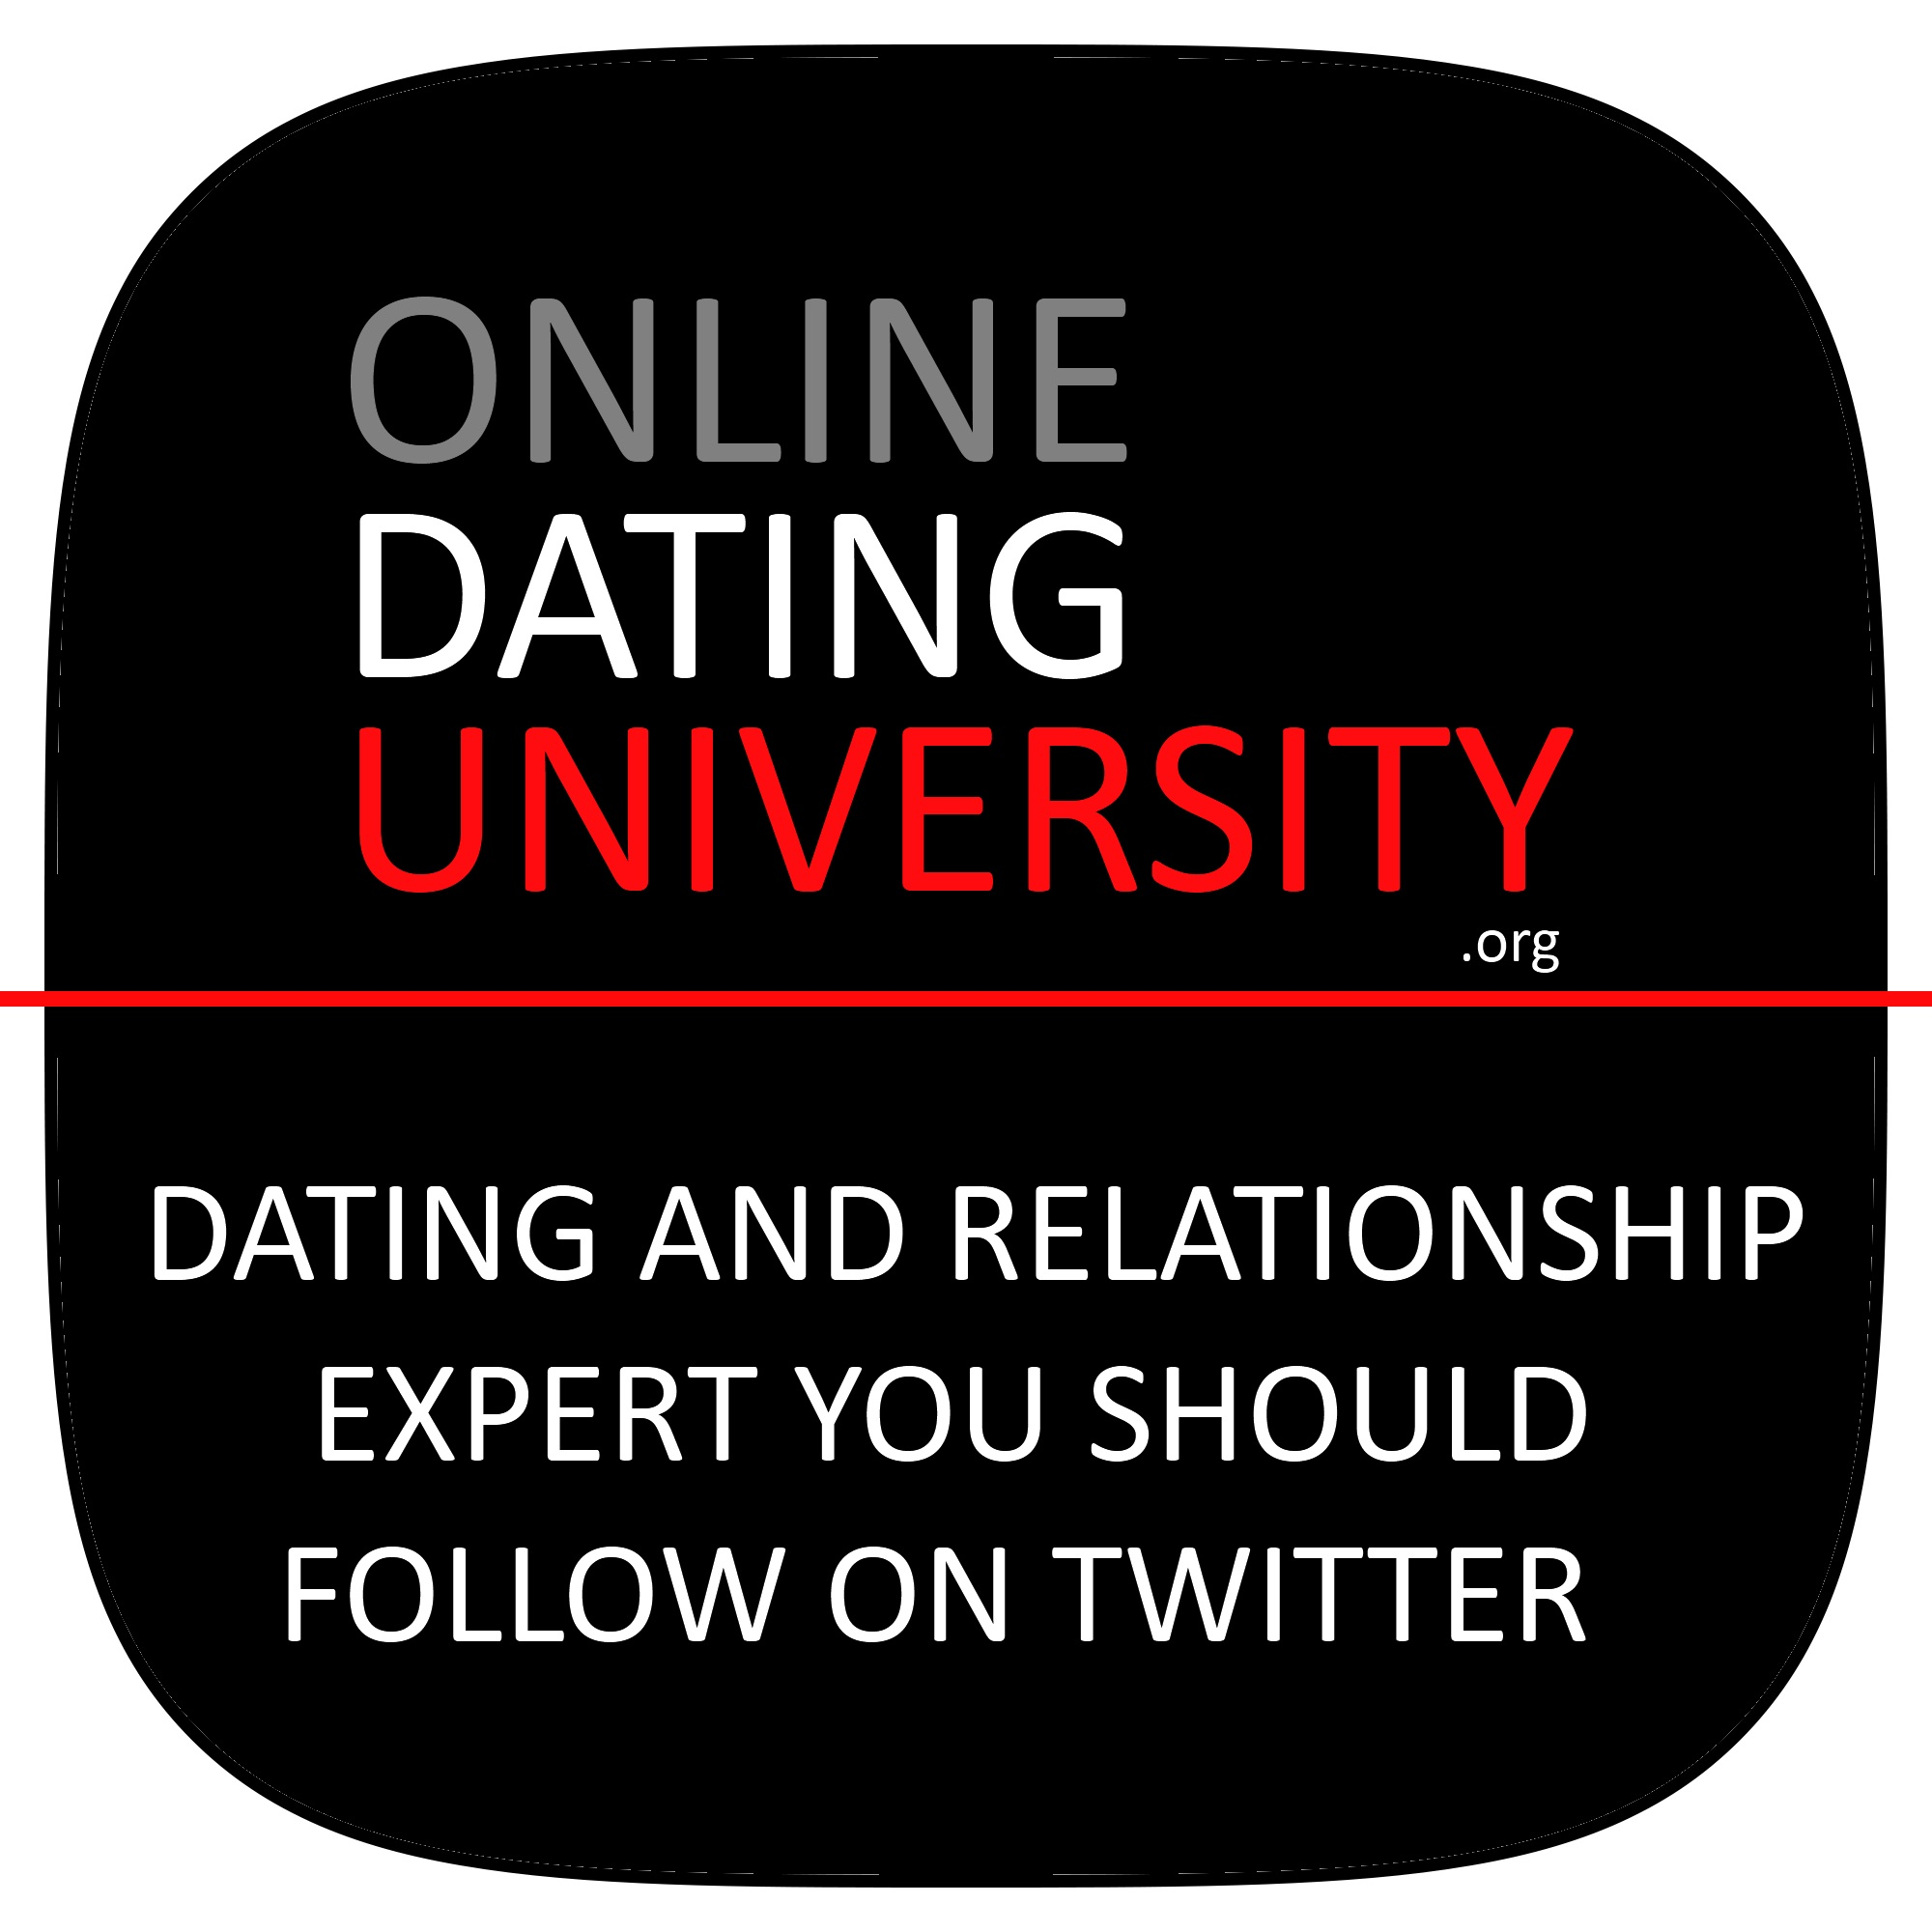 Online dating university